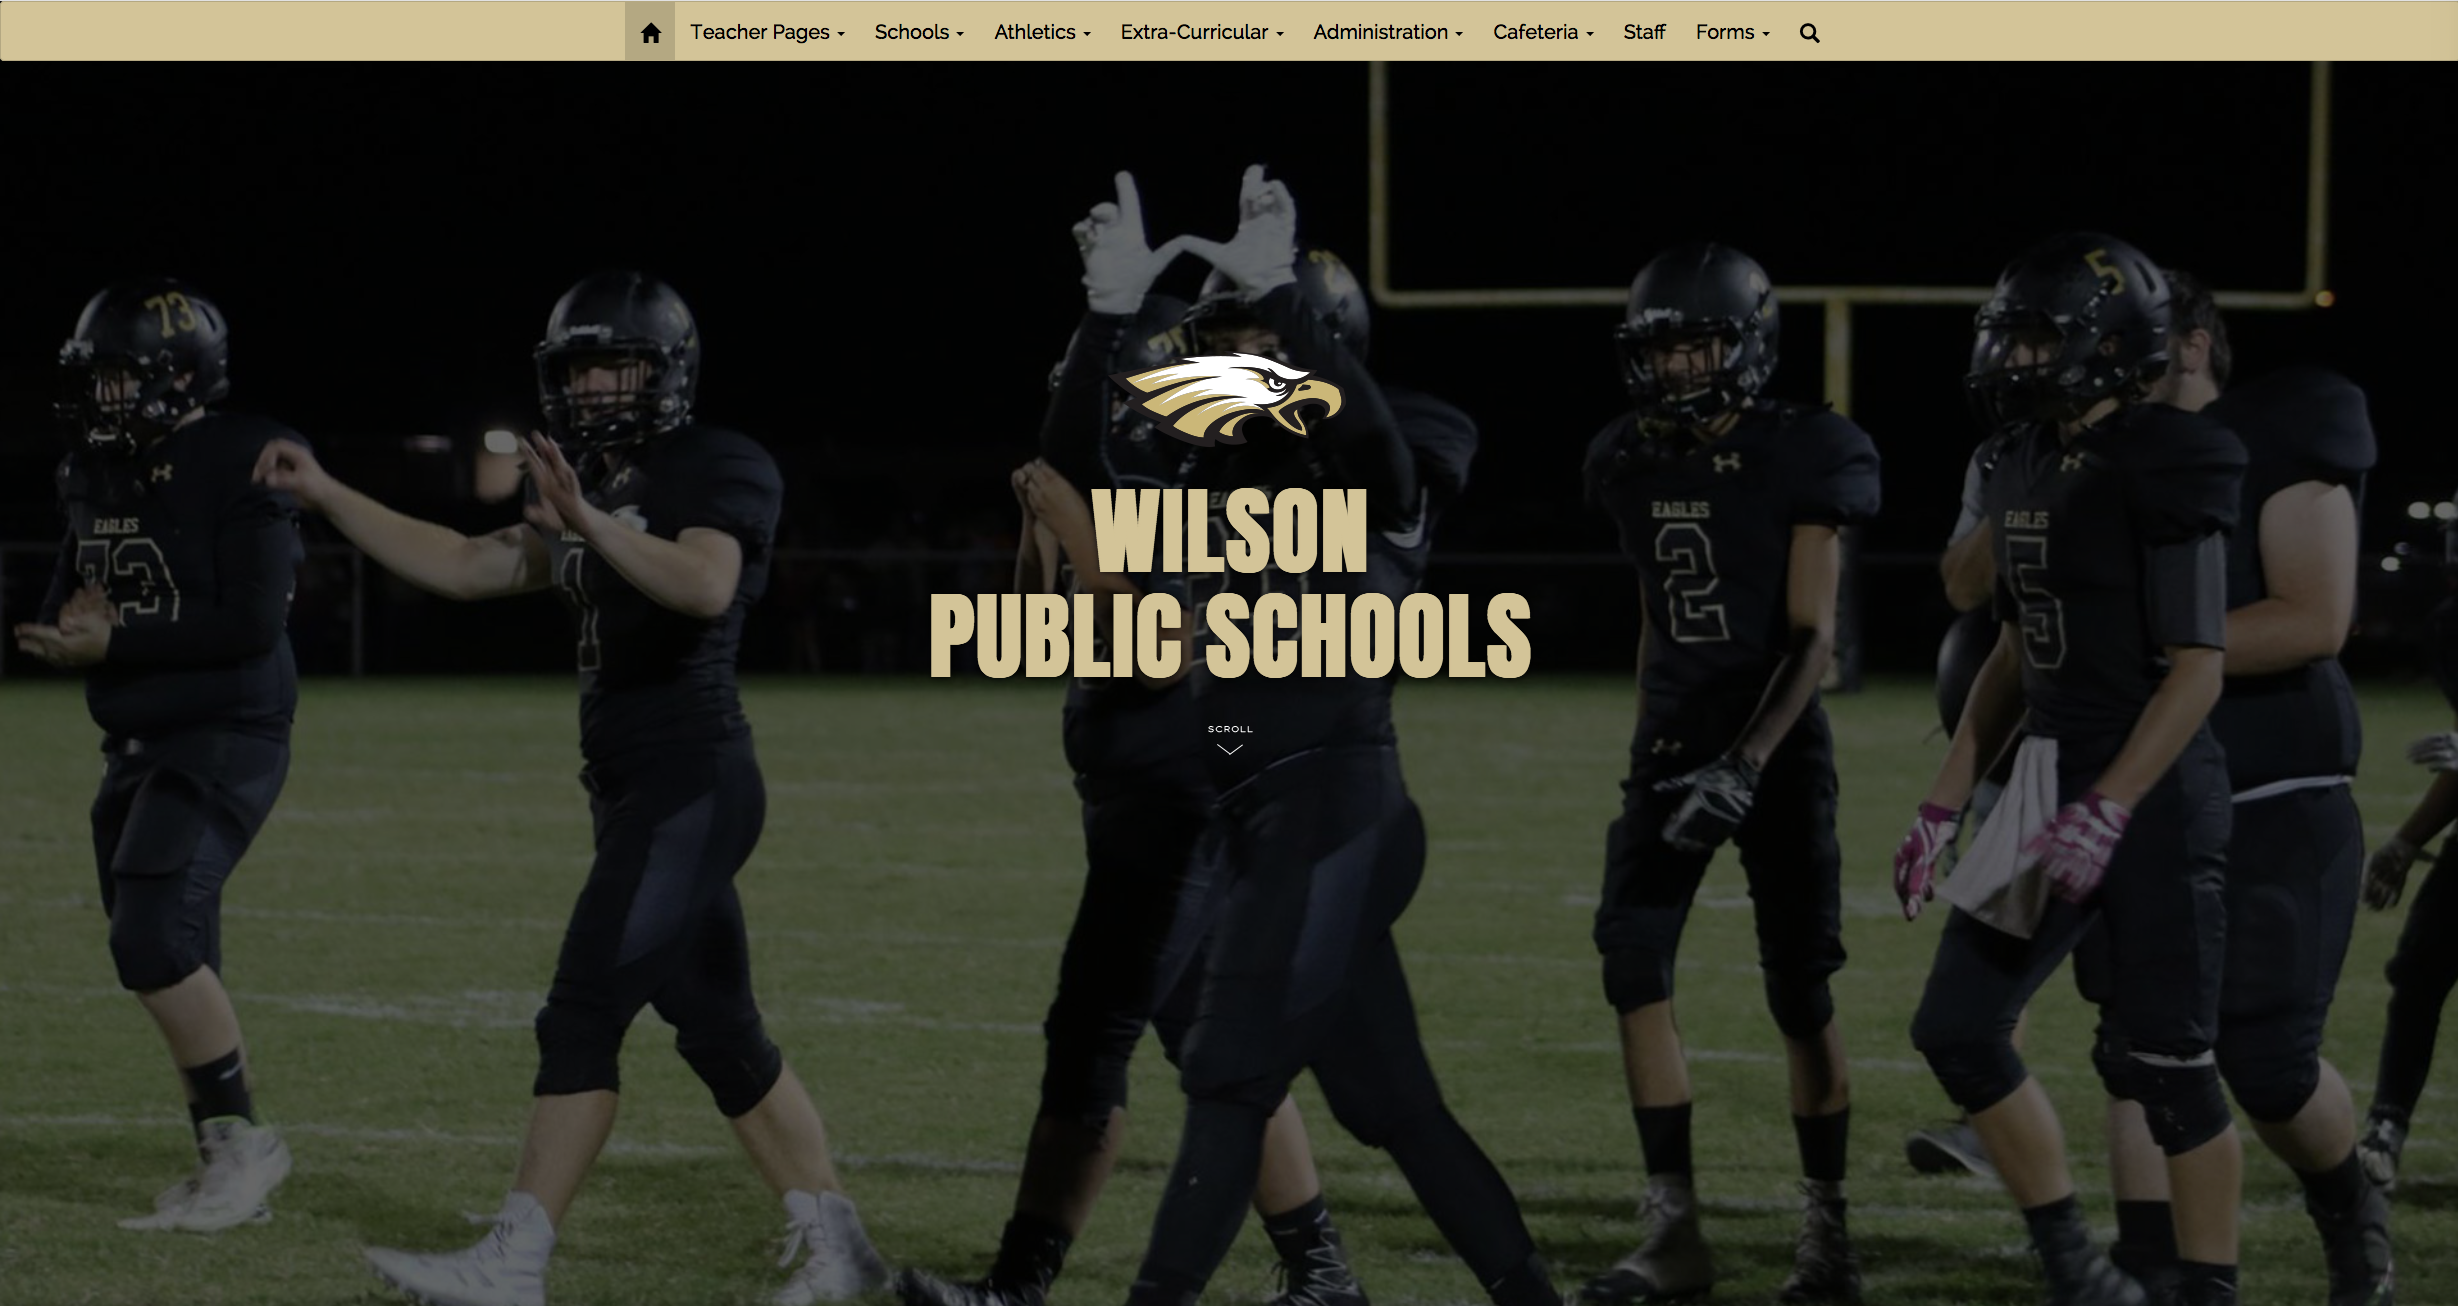 Wilson Public Schools